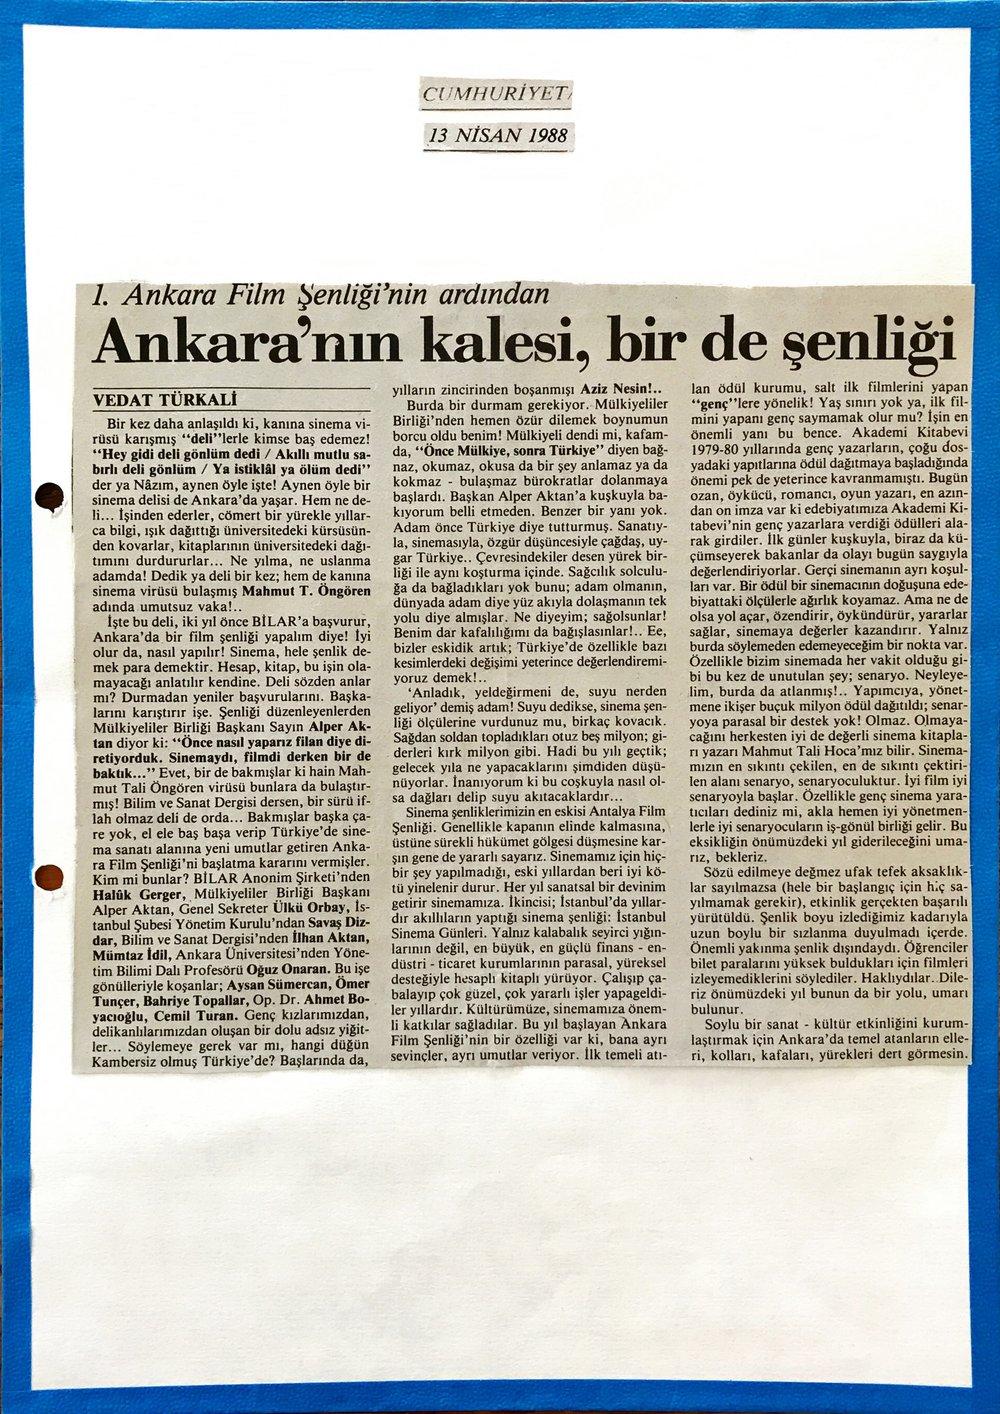 1988_cumhuriyet_vedat-turkali-sinema-festivali.JPG